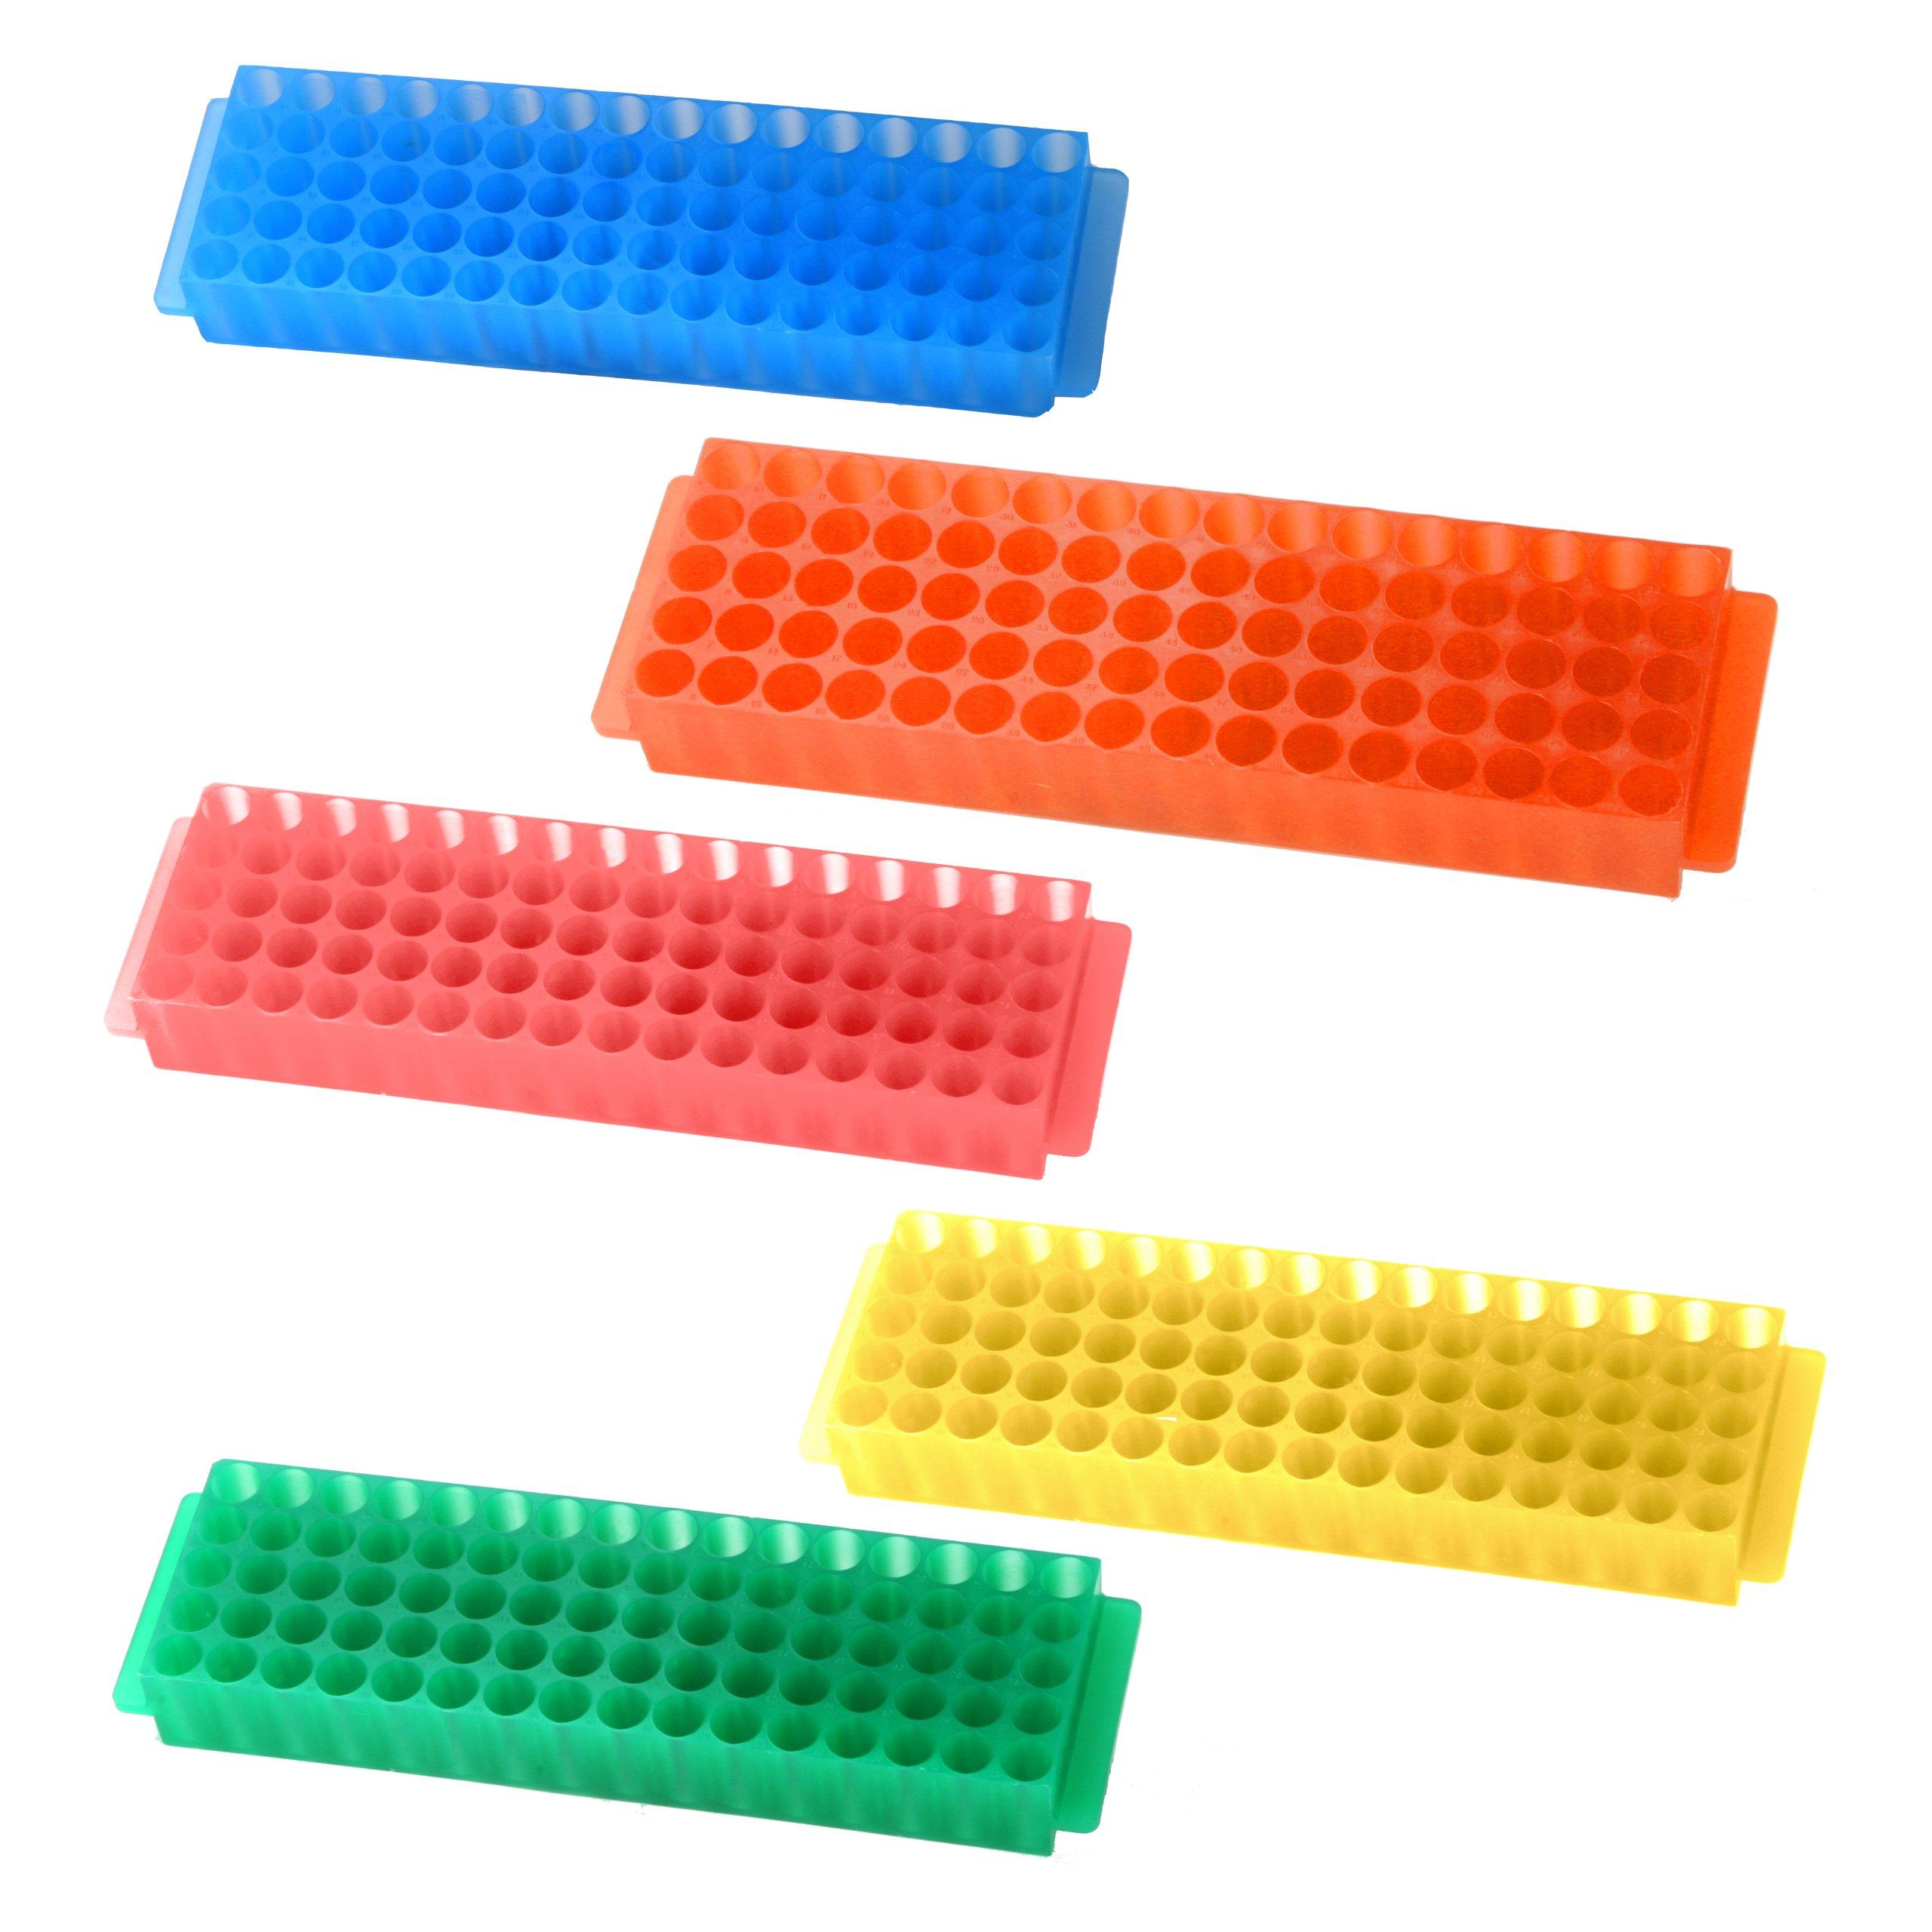 Bio Plas 0061 Assorted Polypropylene Microcentrifuge PCR Tube Rack, 80-Well, Pack of Five